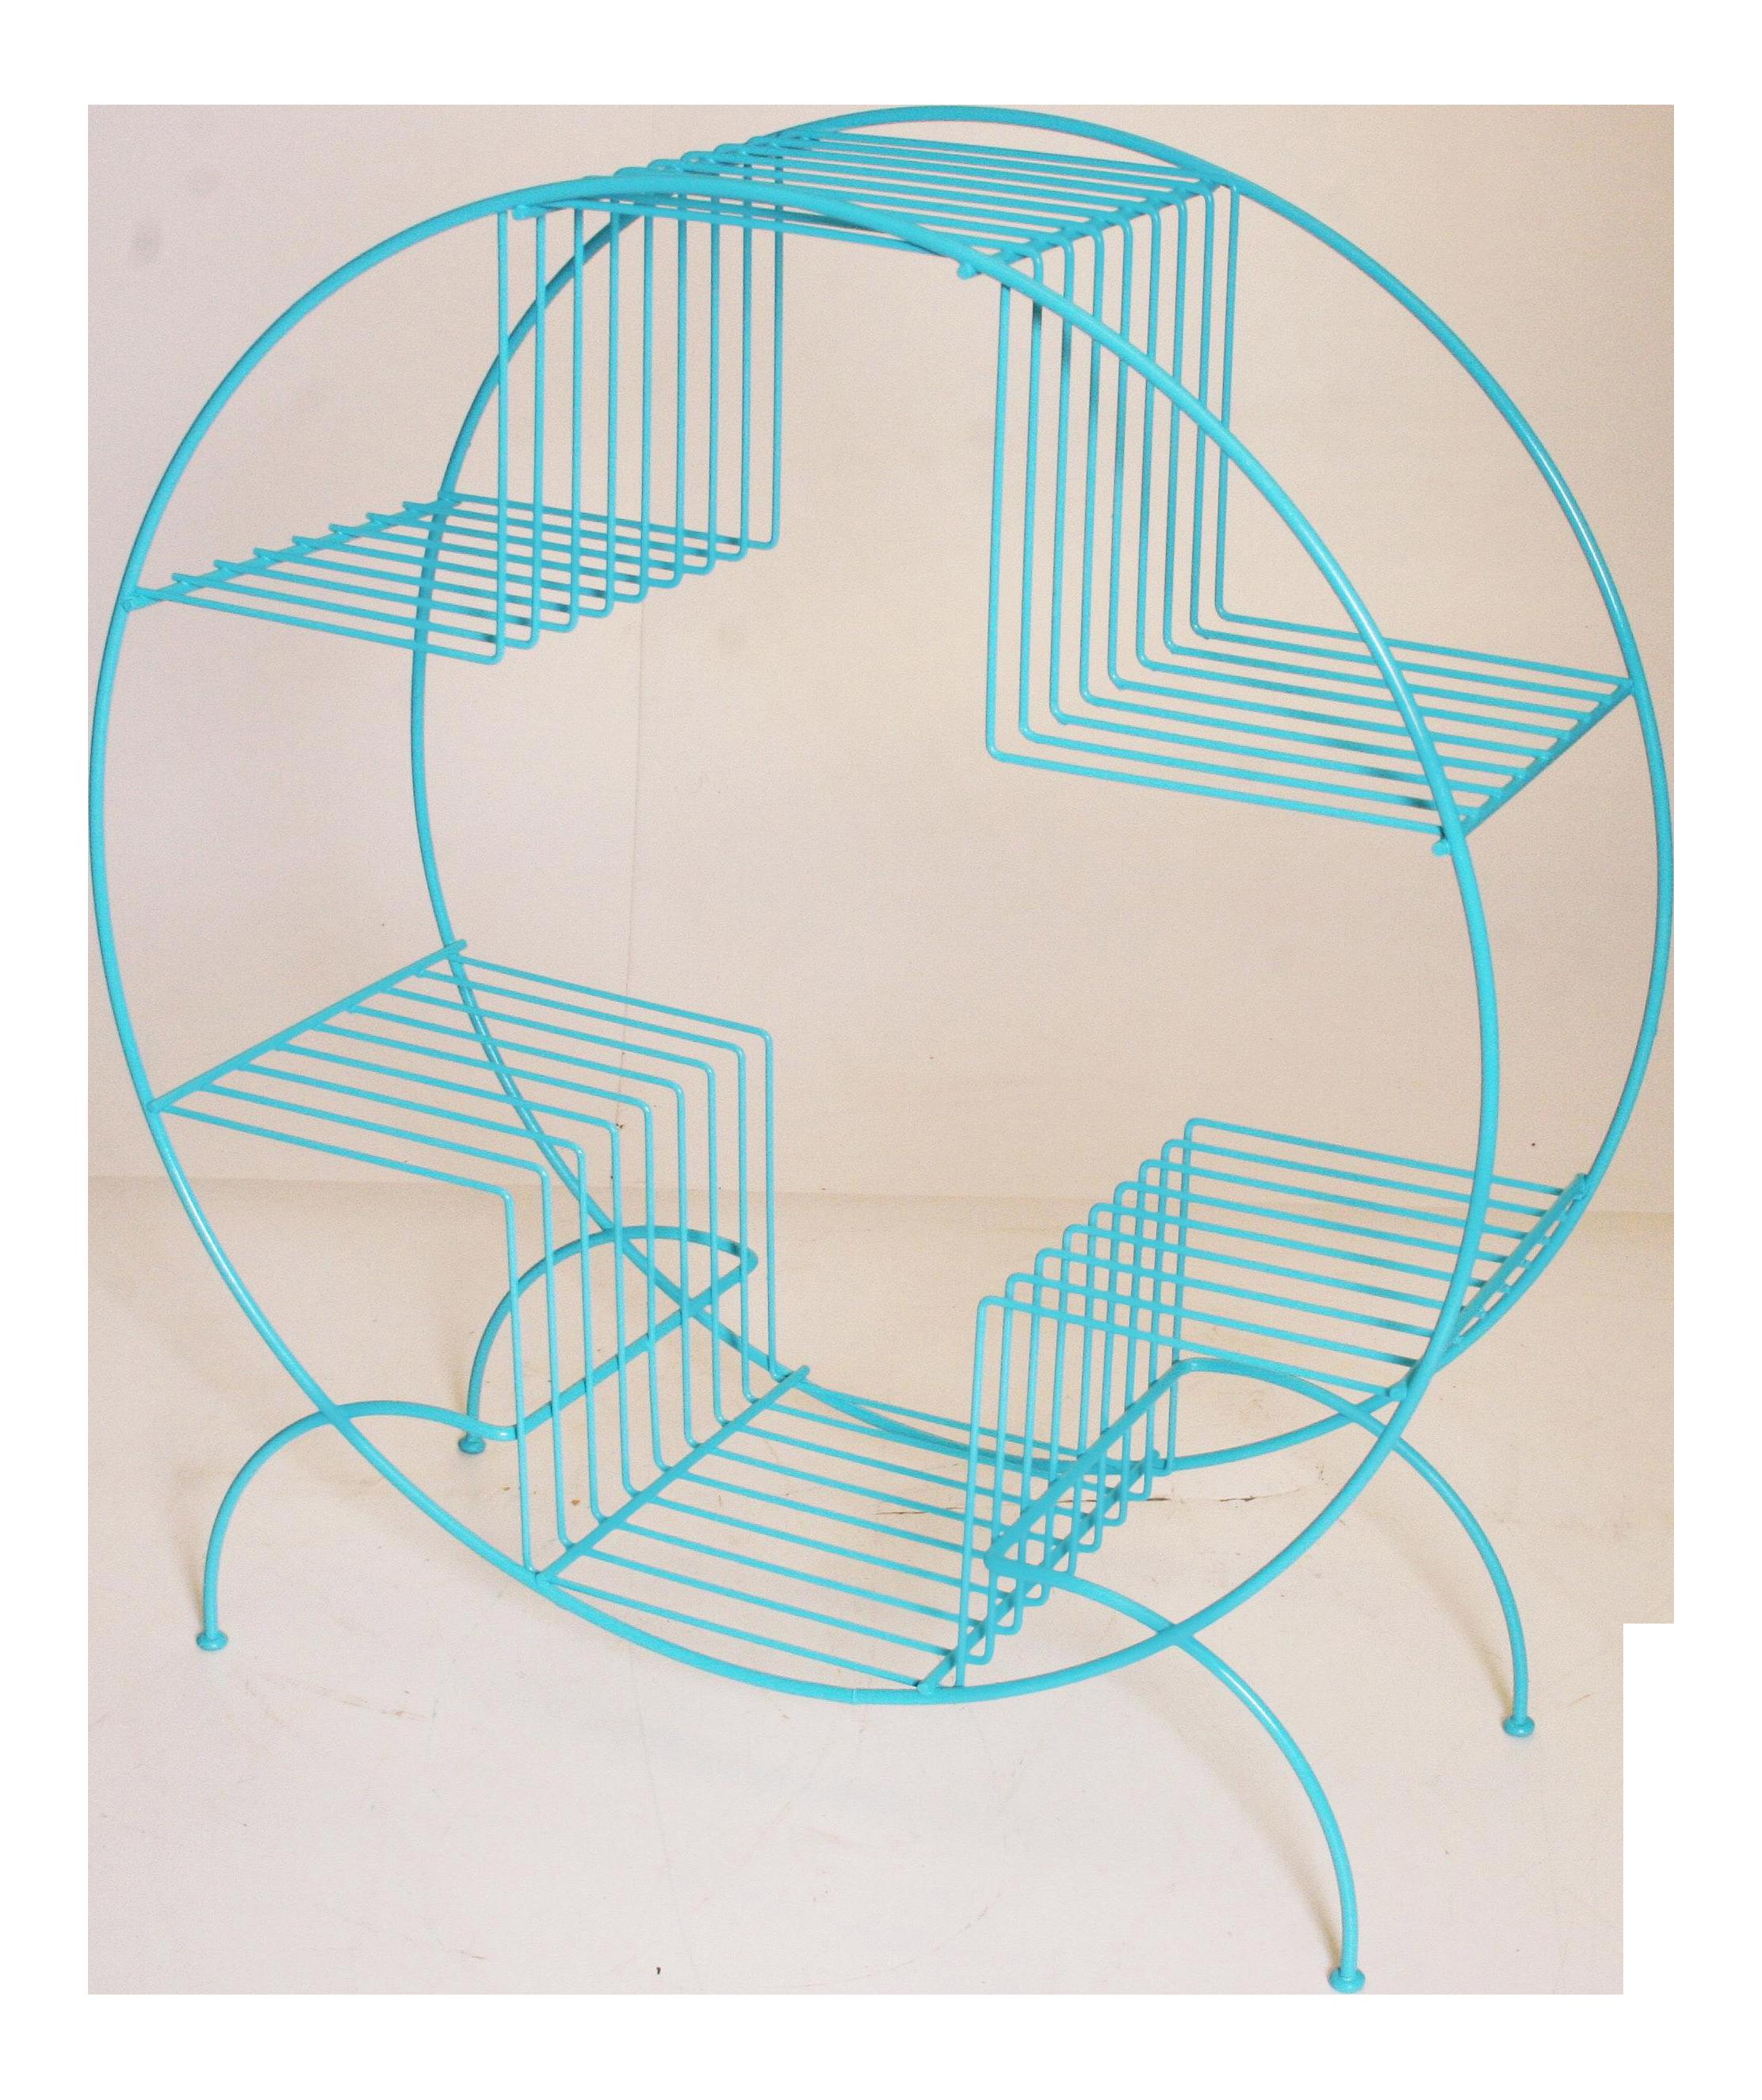 Mid Century Modern Teal Round Wire Plant Stand | Pinterest | Mid ...